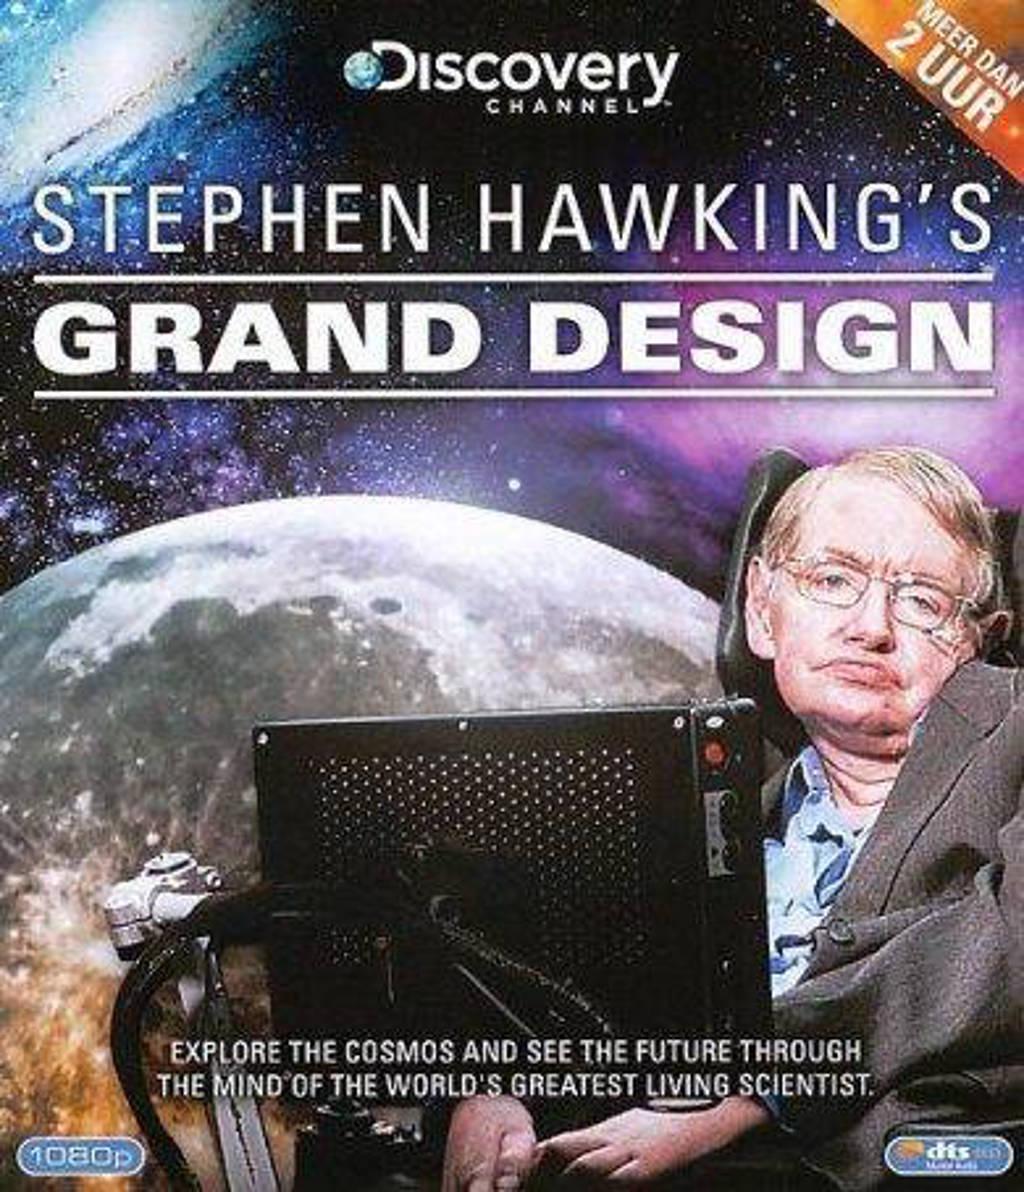 Stephen Hawking's grand design (Blu-ray)